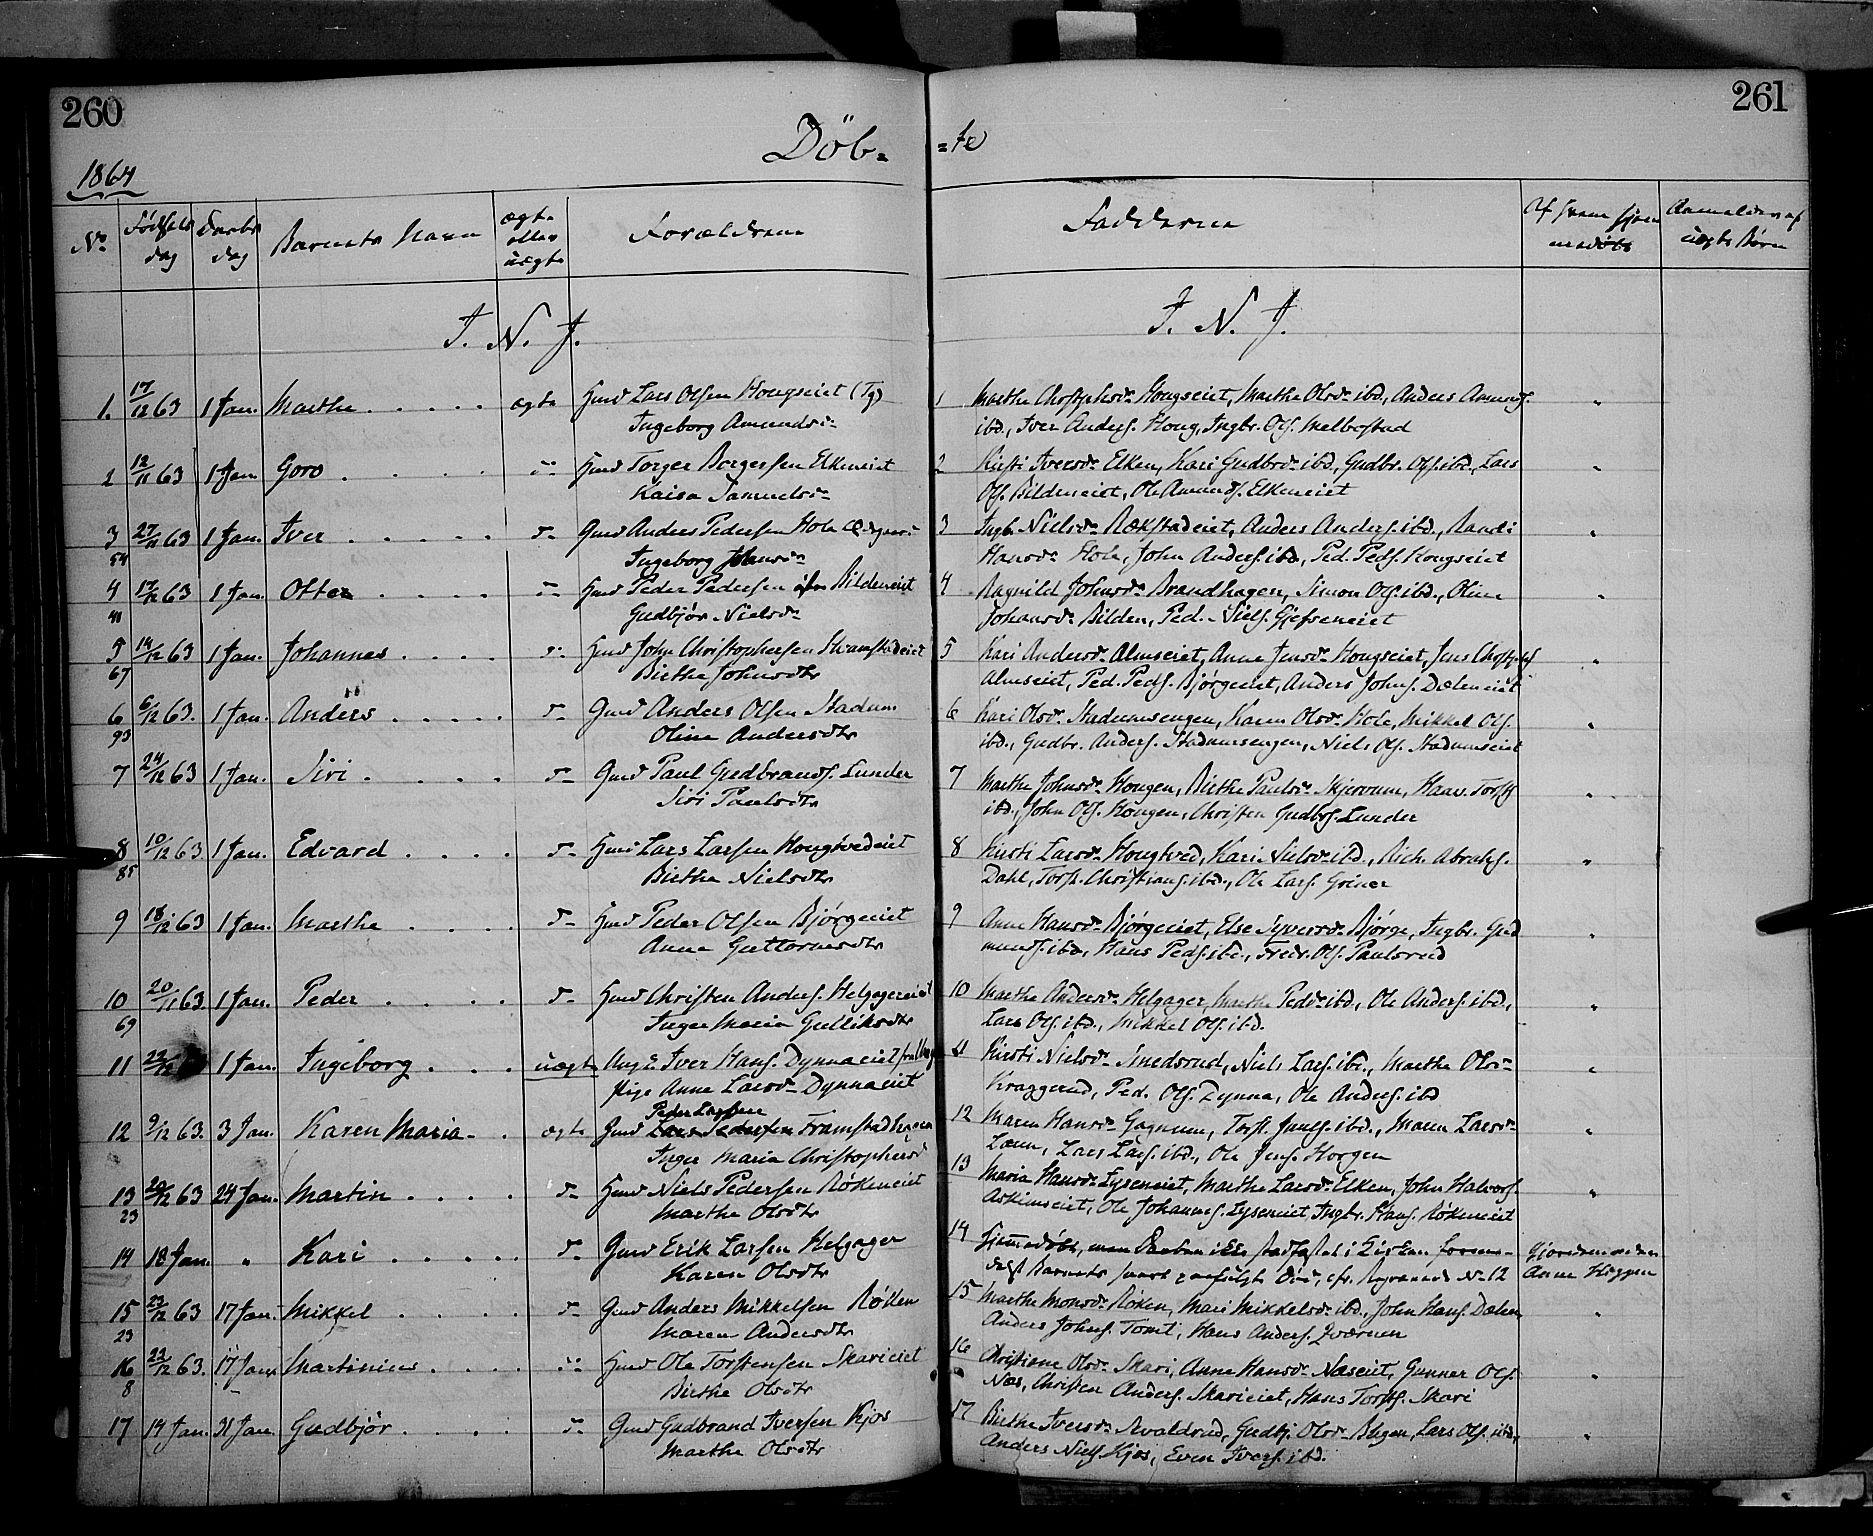 SAH, Gran prestekontor, Ministerialbok nr. 12, 1856-1874, s. 260-261